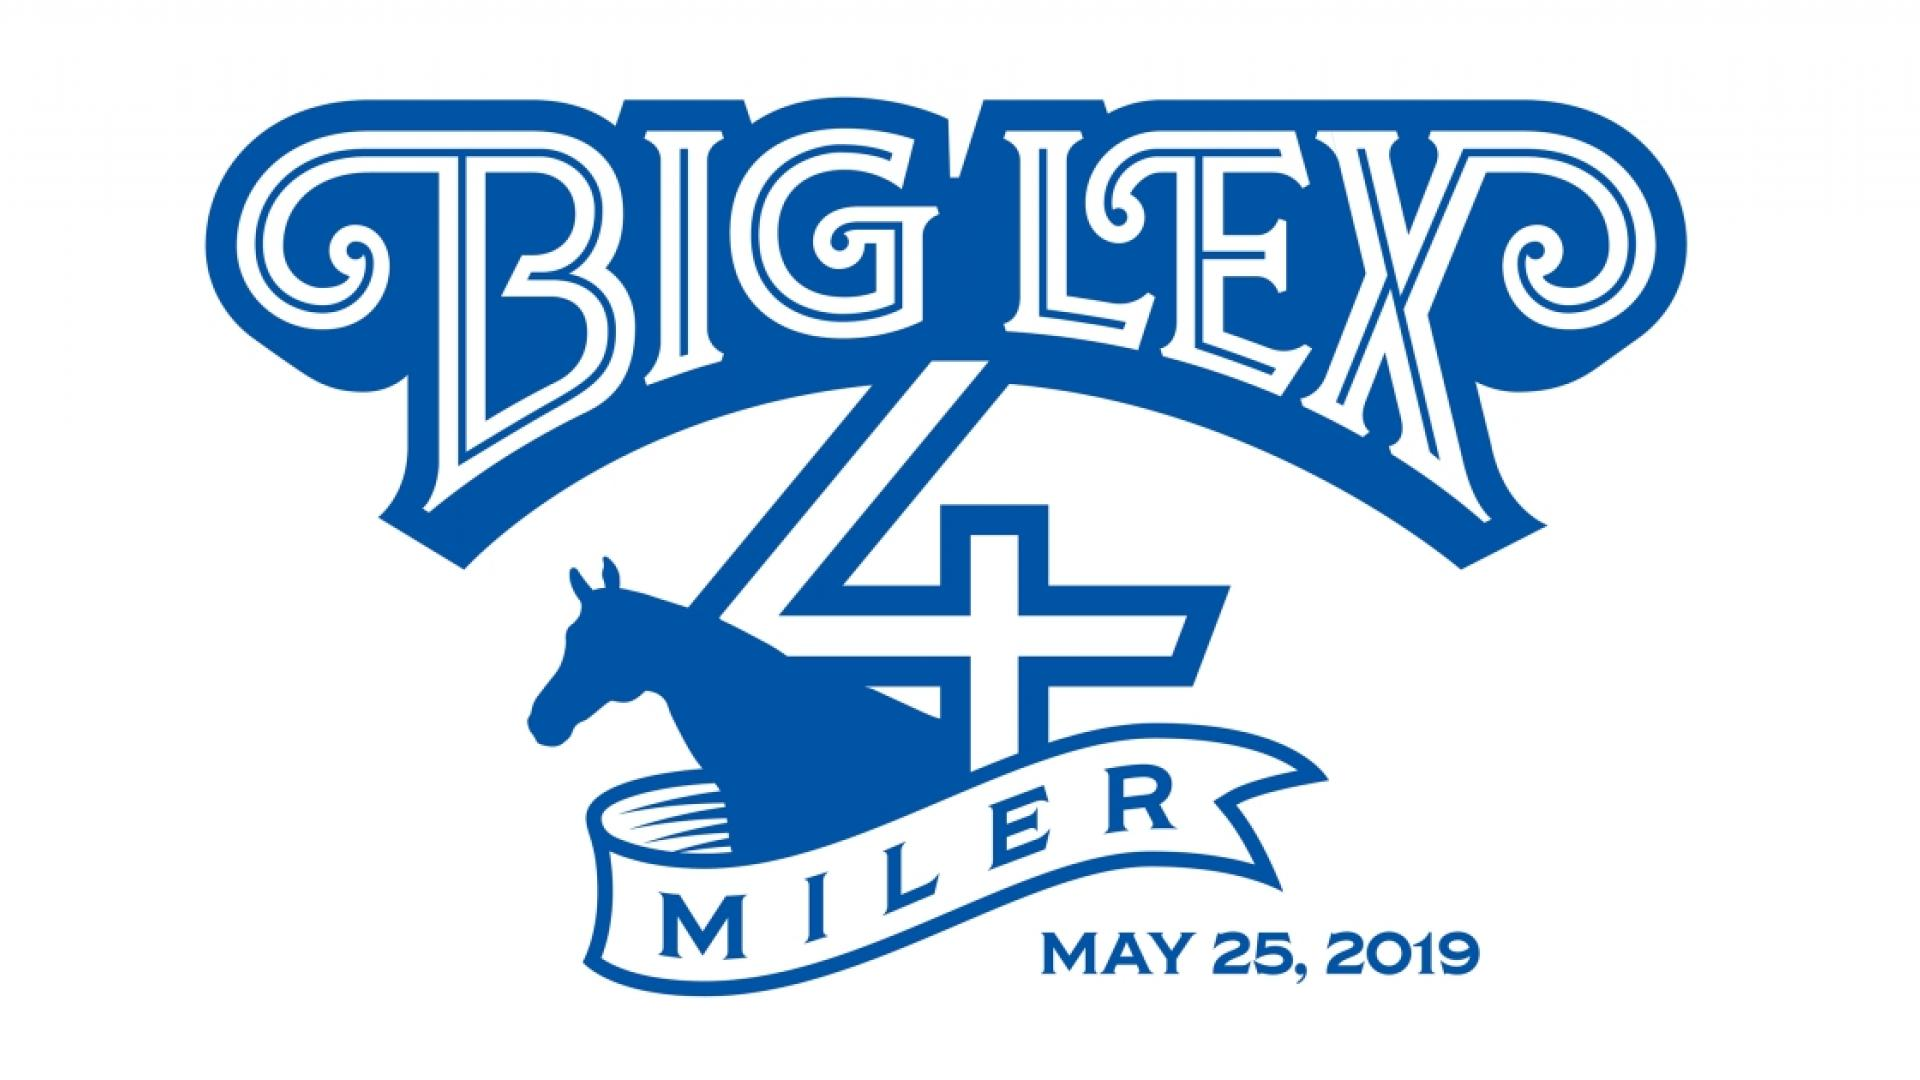 Big LEX 4 miler